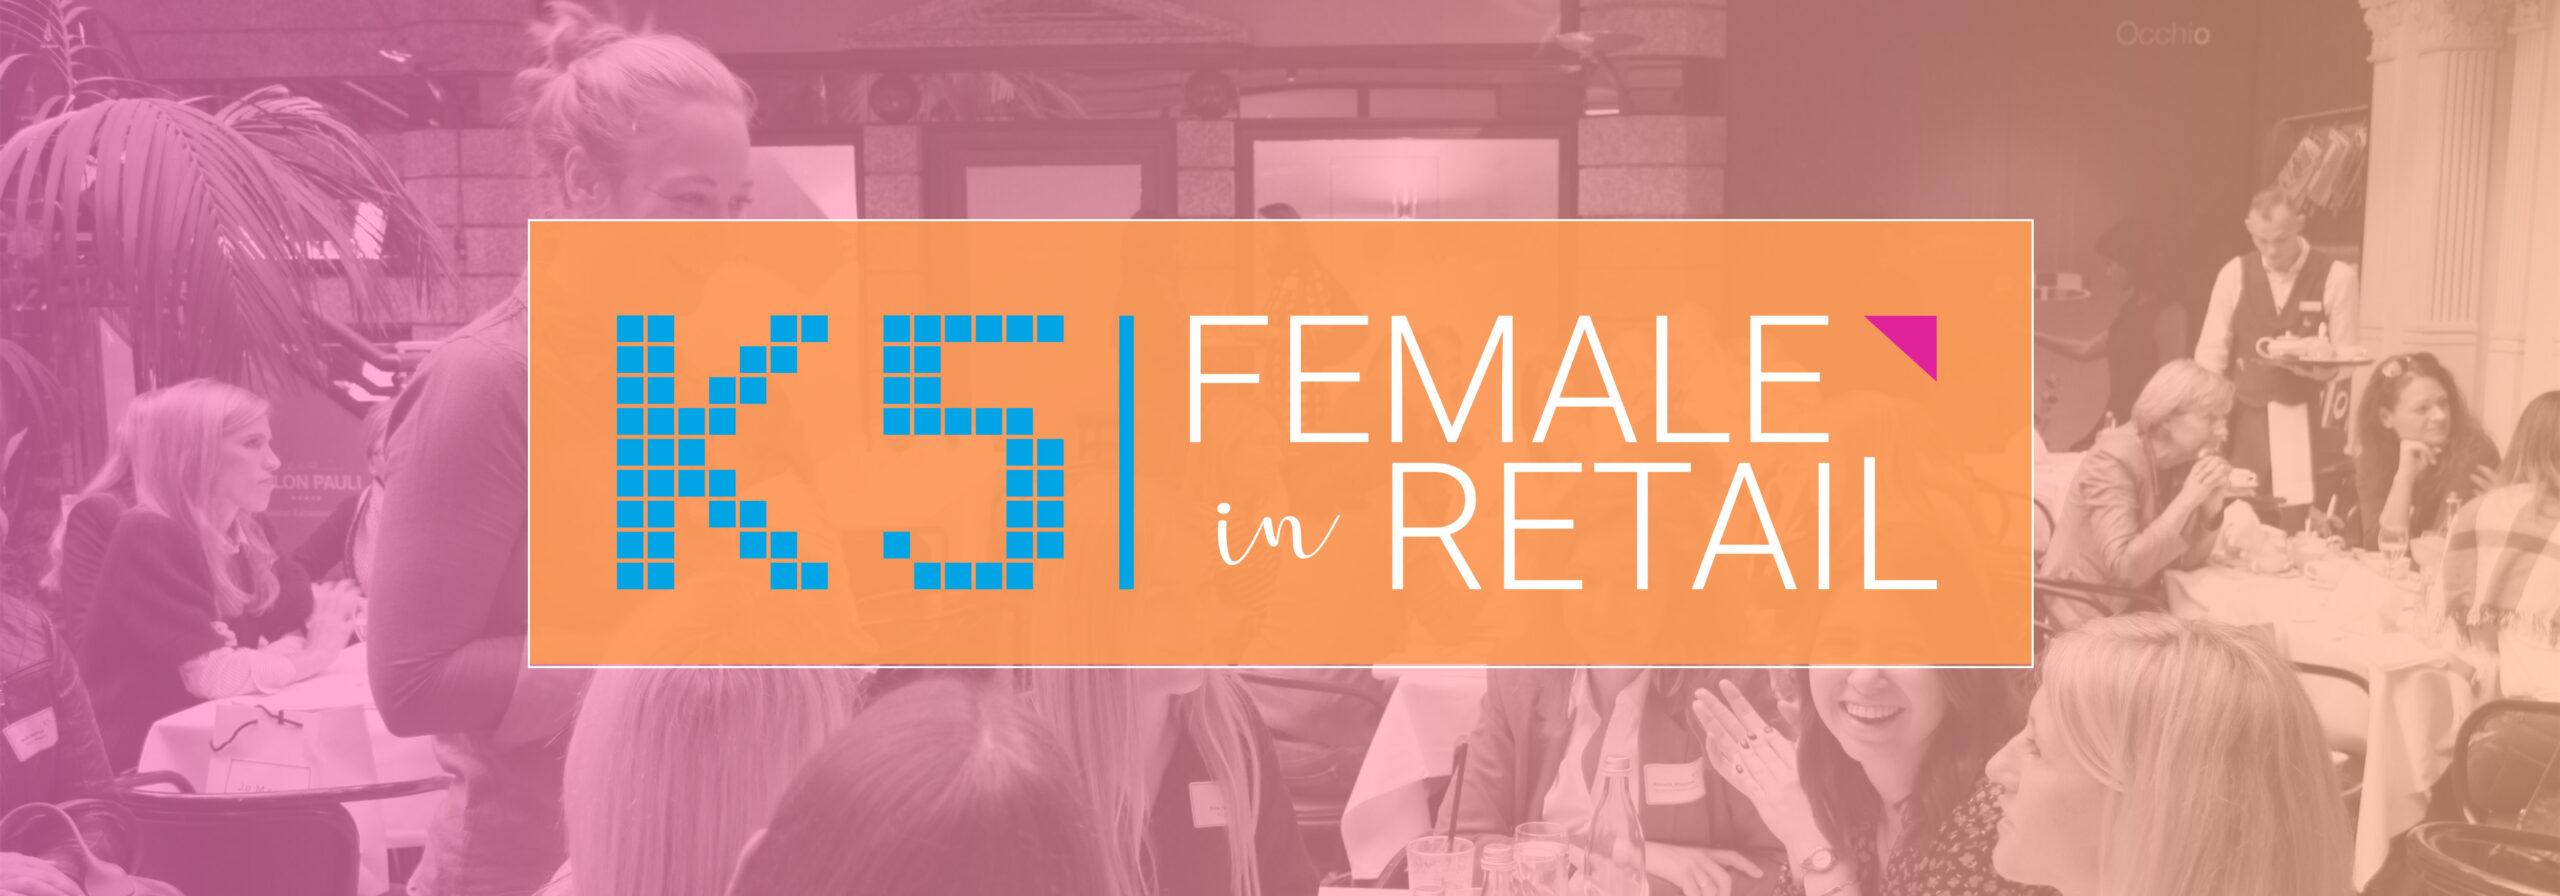 K5 Female in Retail